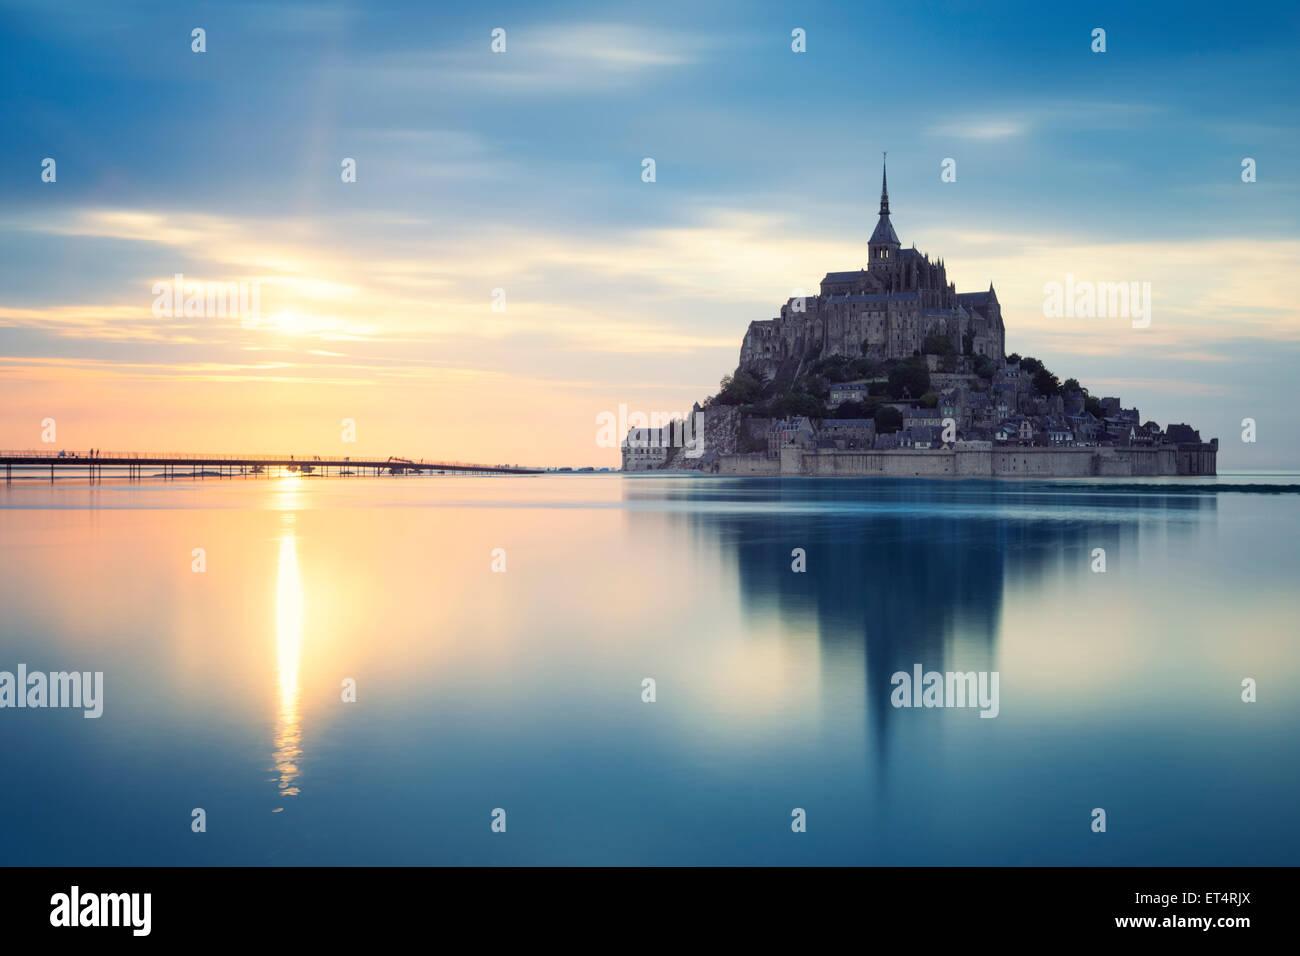 Mont-Saint-Michel bei Sonnenuntergang, Frankreich, Europa. Stockbild